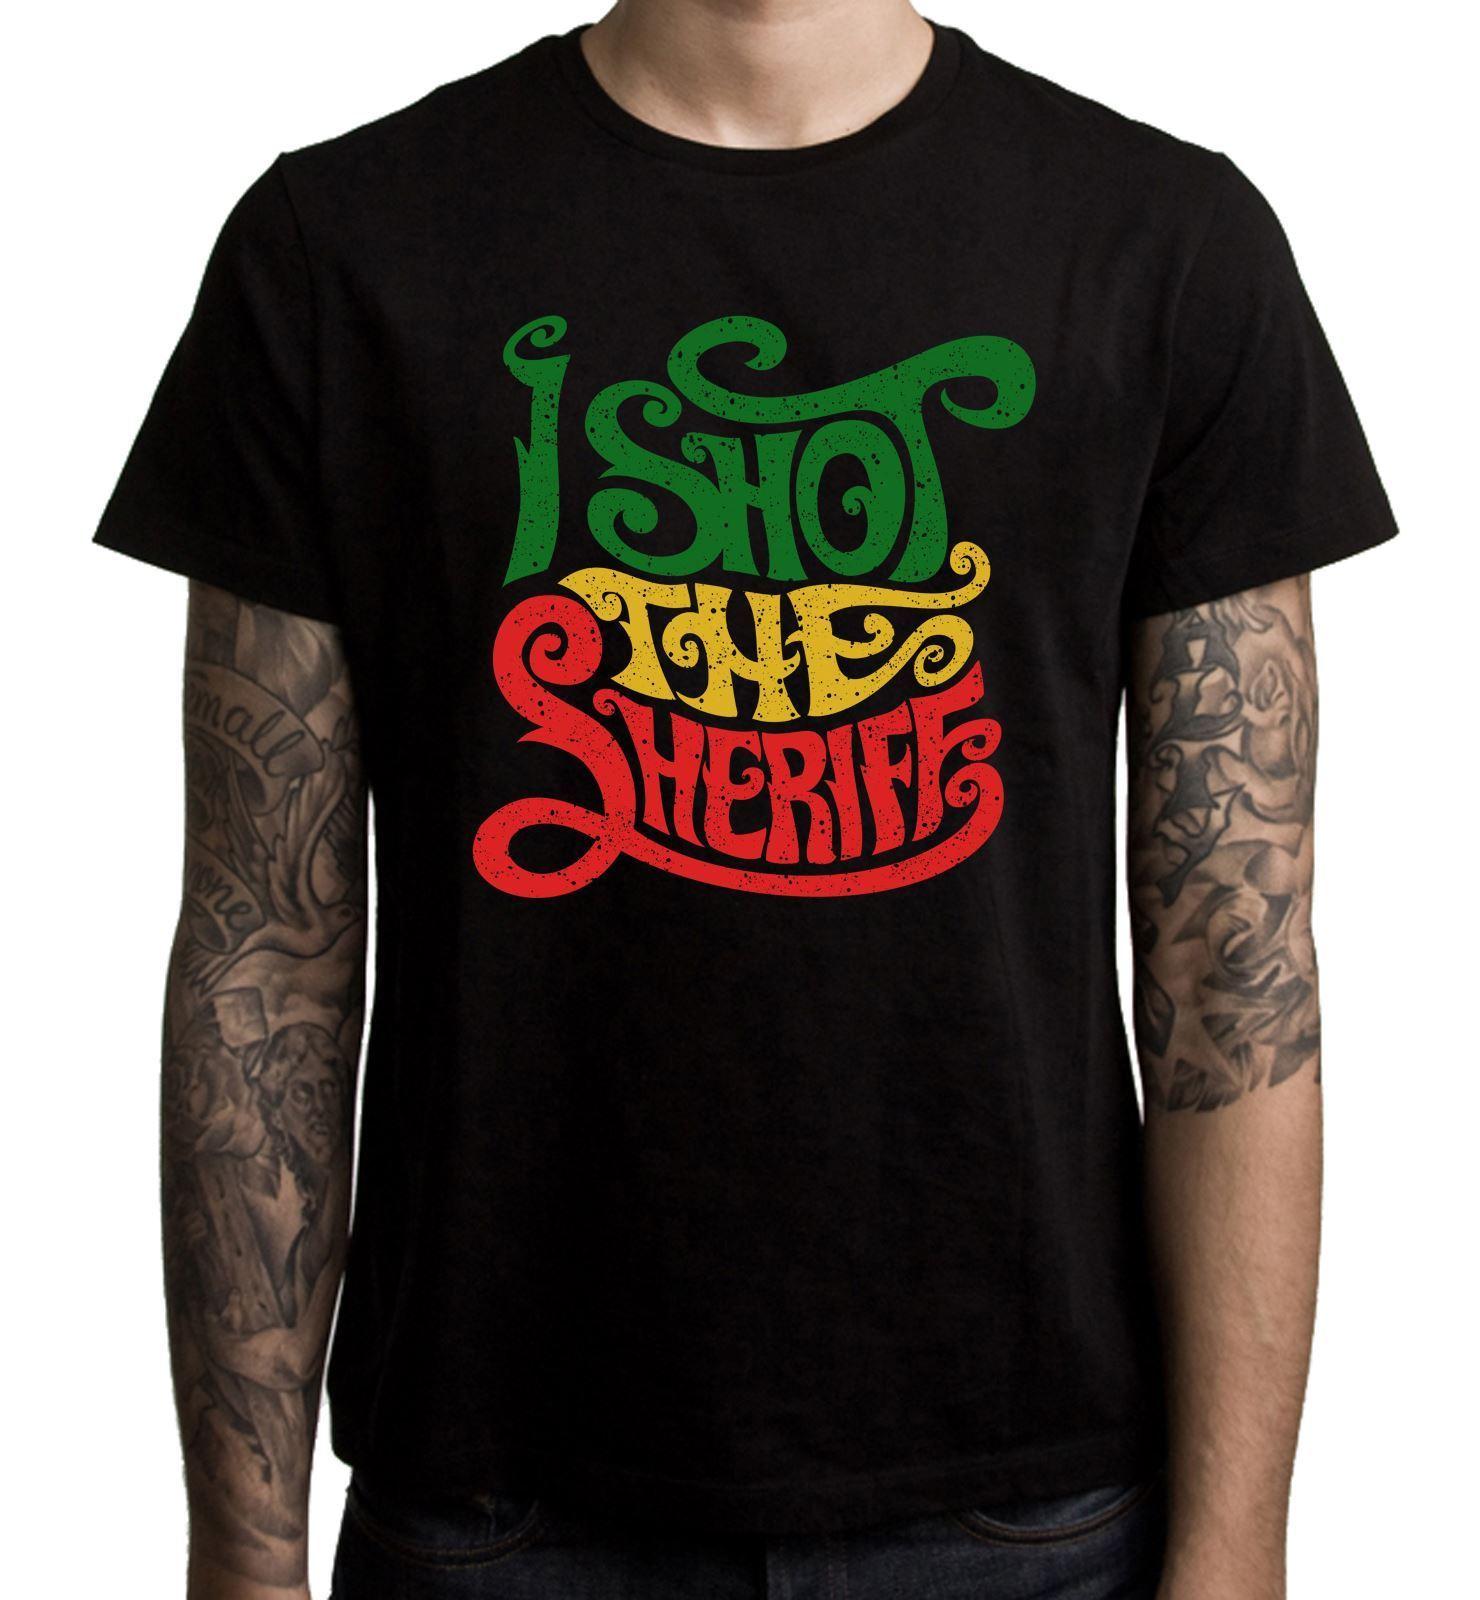 Я снимал шерифа регги Для мужчин футболка-раста Rastfarian Боб Марли Для мужчин Повседневное короткий рукав футболки